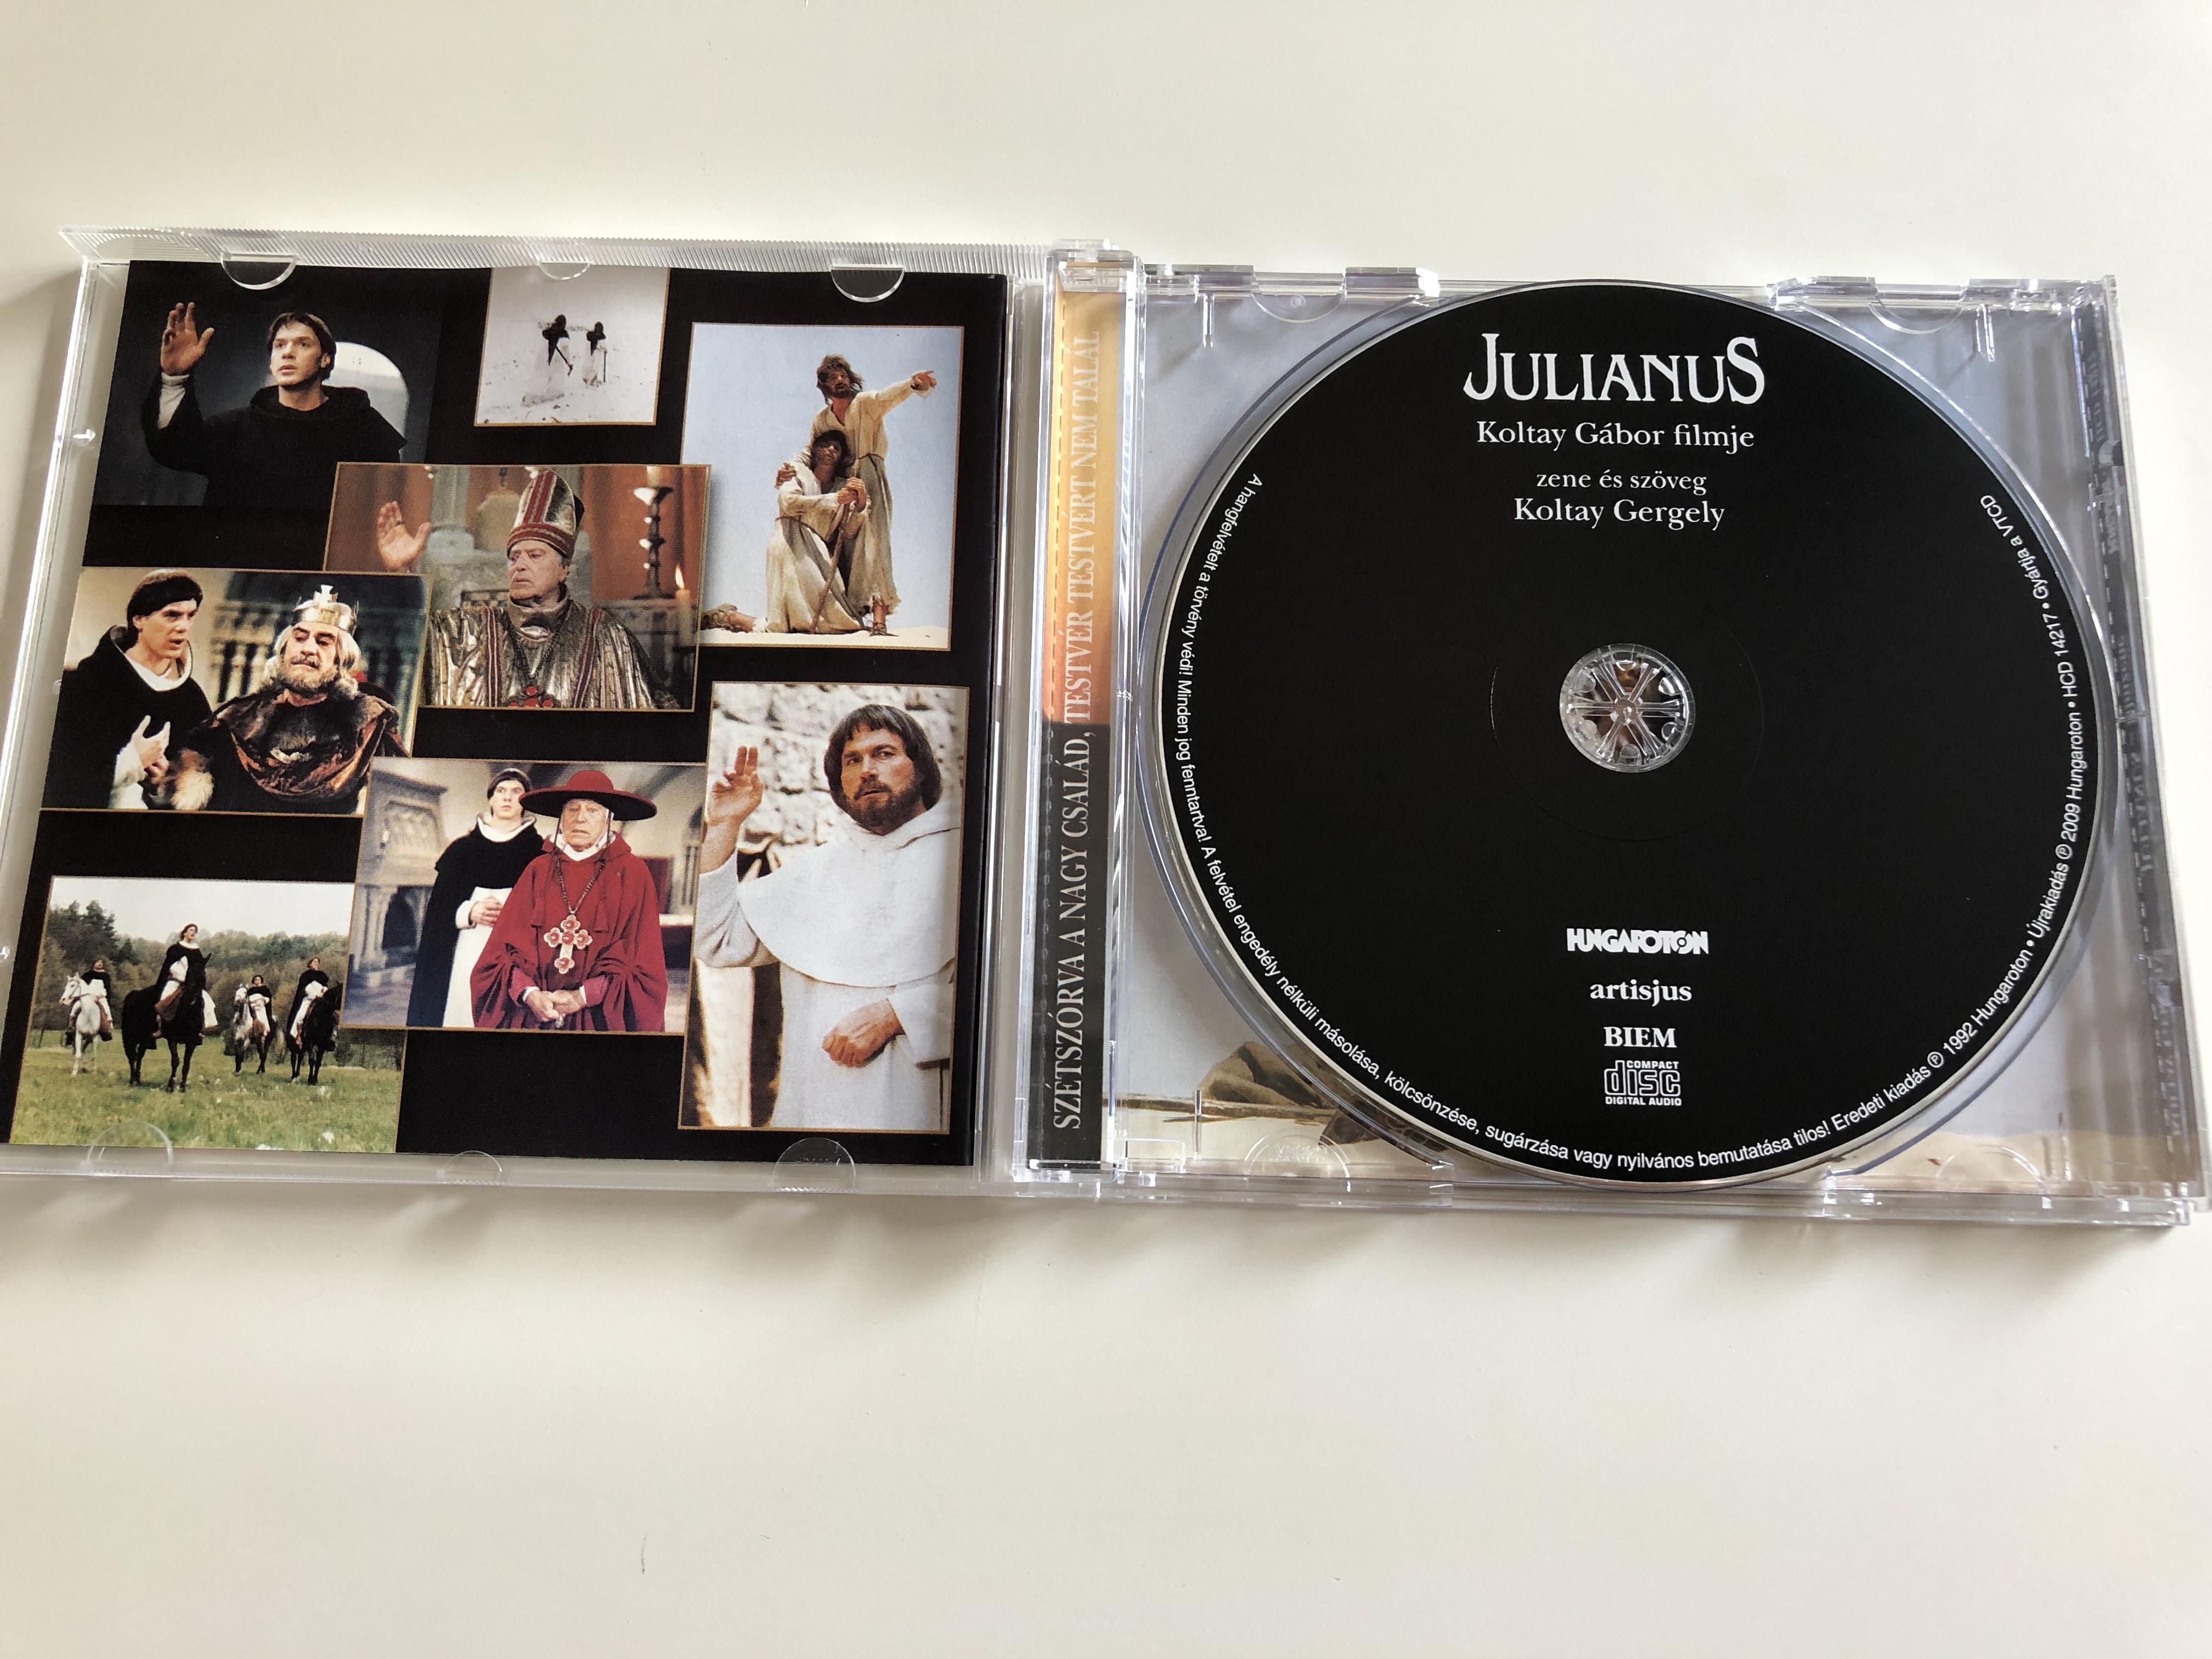 julianus-filmzene-ost-directed-by-koltay-g-bor-music-and-text-by-koltay-gergely-sz-tsz-rva-a-nagy-csal-d-testv-r-testv-rt-nem-tal-l-bonus-feh-rl-fia-istensz-l-tte-kormor-n-hungaroton-5-.jpg